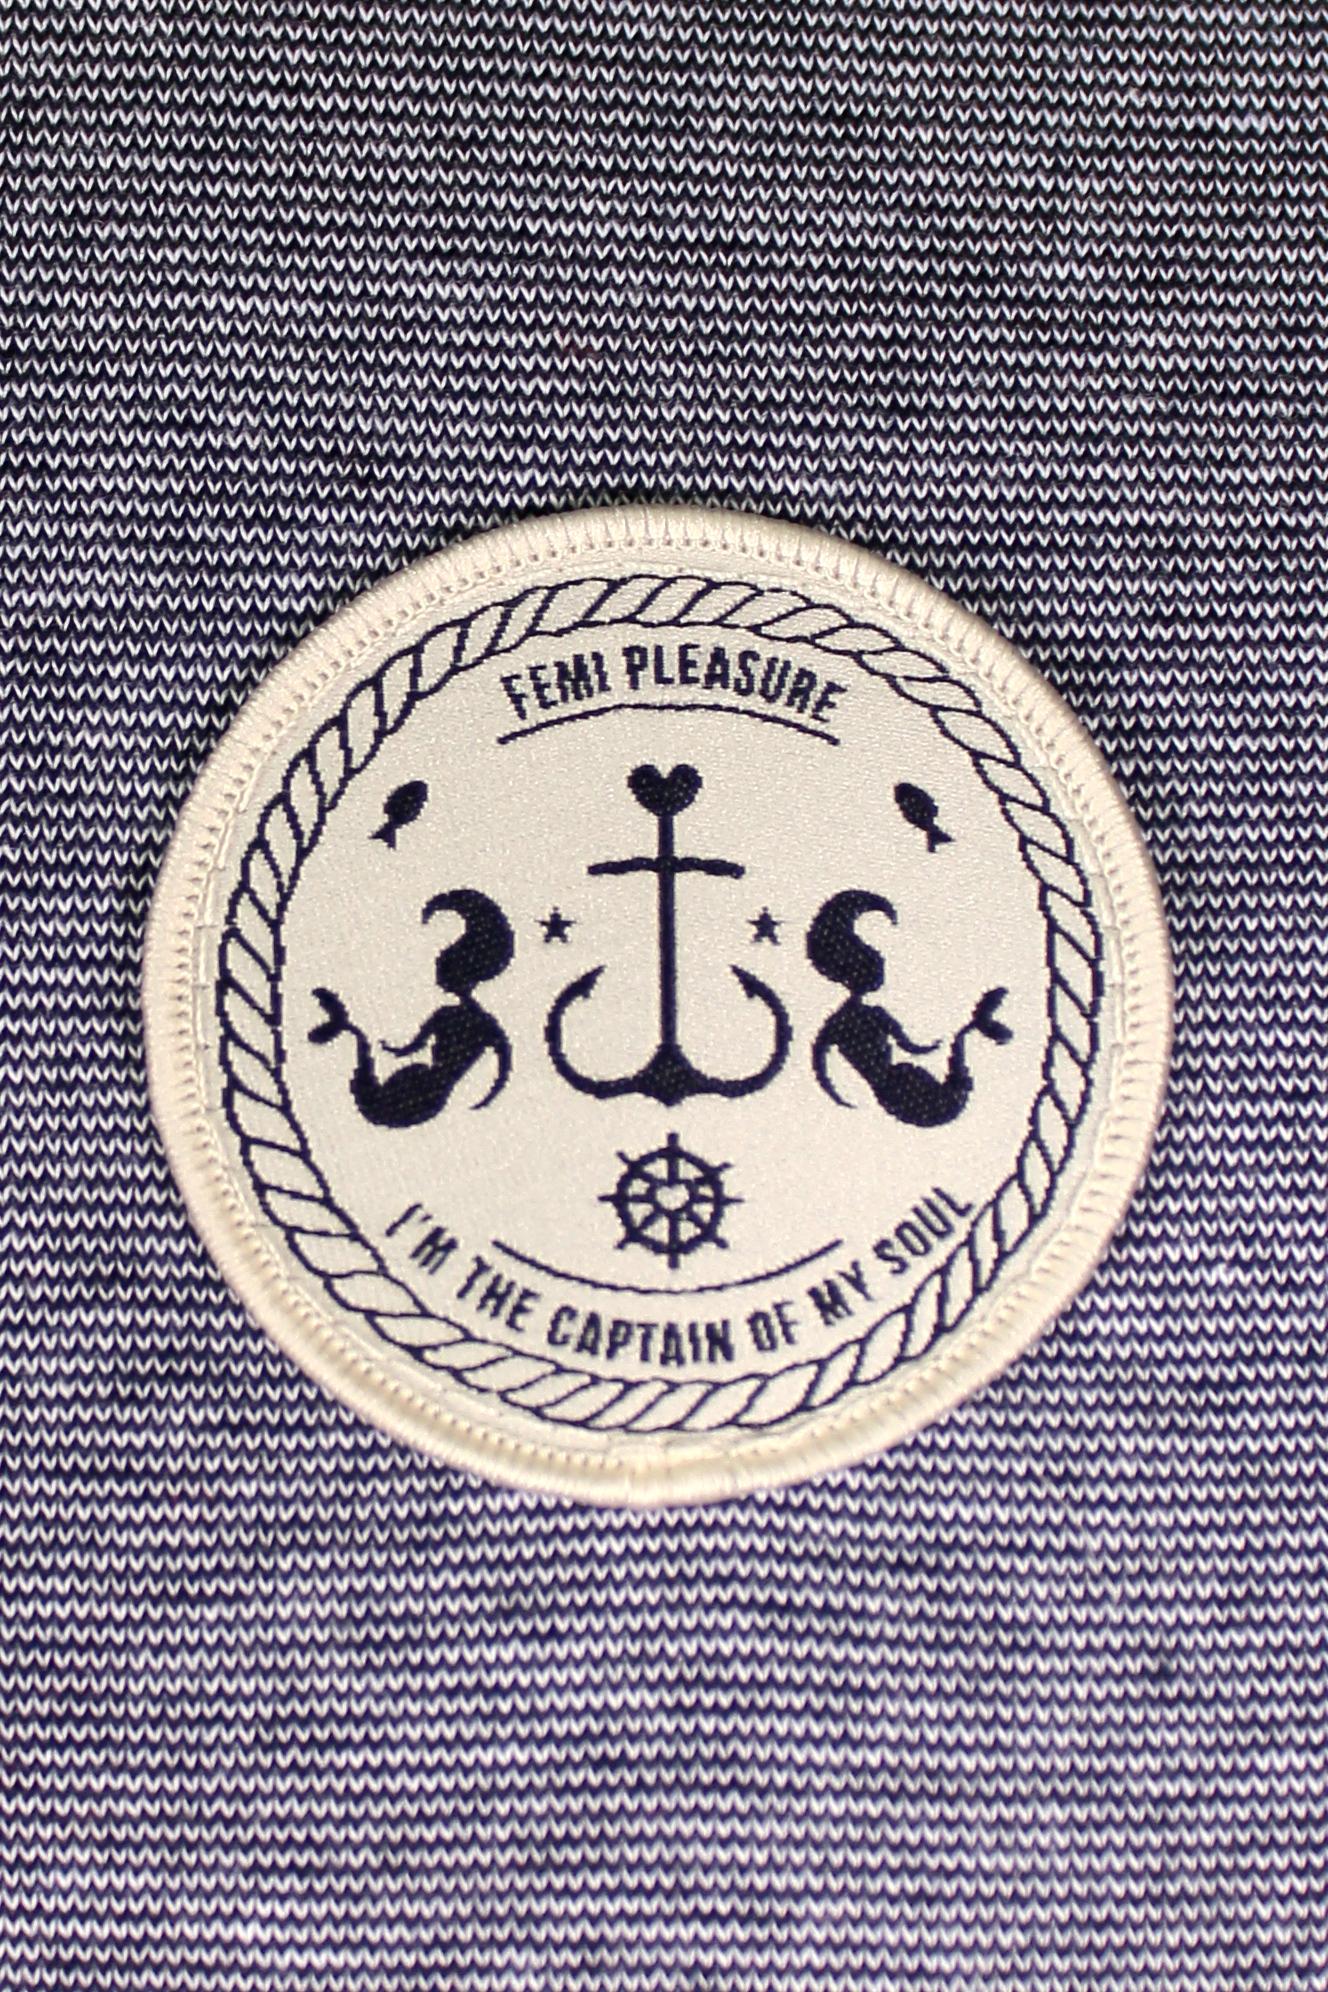 Sukienka Damska Femi Pleasure Tanga (Navy Vanilla Stripe)